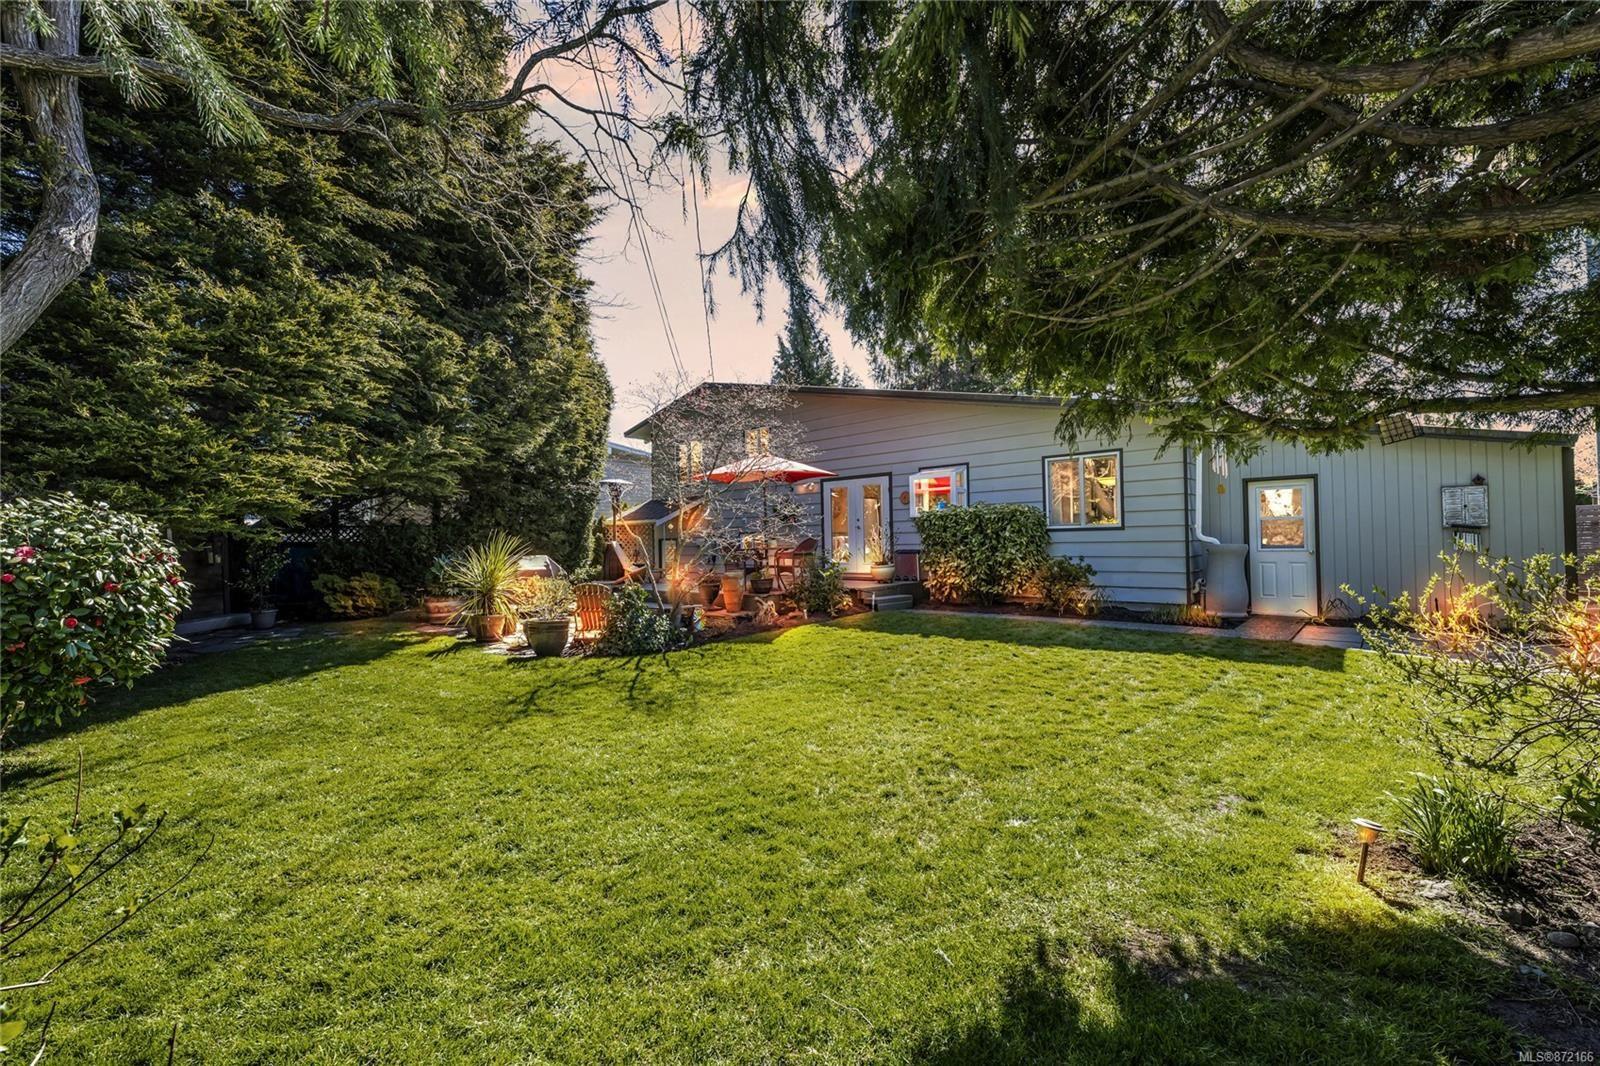 Photo 25: Photos: 1690 Blair Ave in : SE Lambrick Park House for sale (Saanich East)  : MLS®# 872166